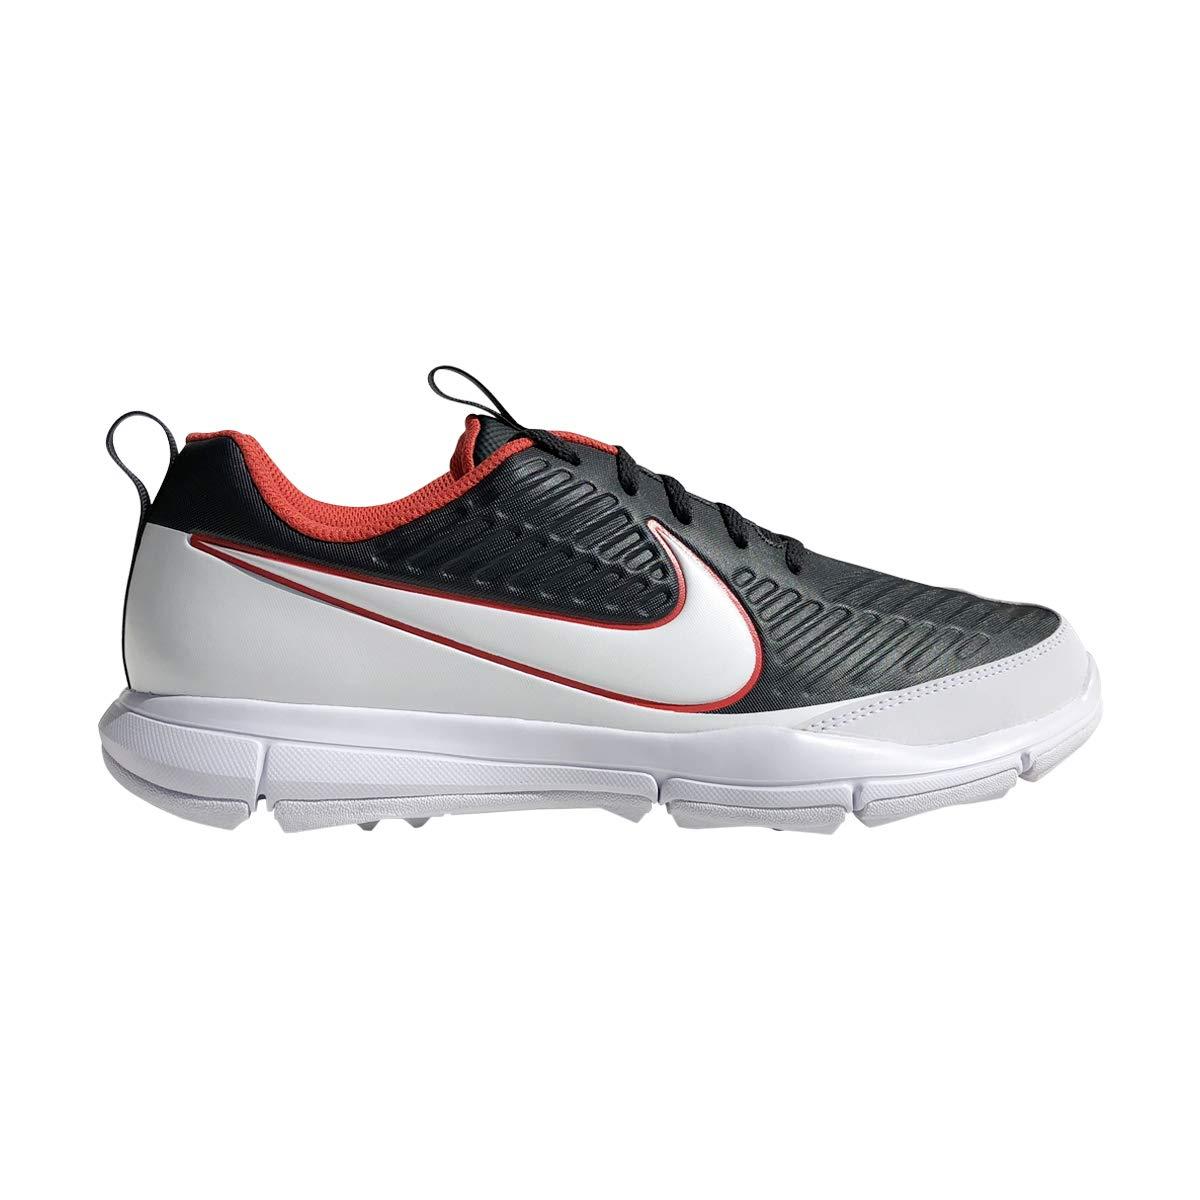 Nike Mens Explorer 2 Golf Shoe (10 D(M) US, Anthracite/White-Max Orange)